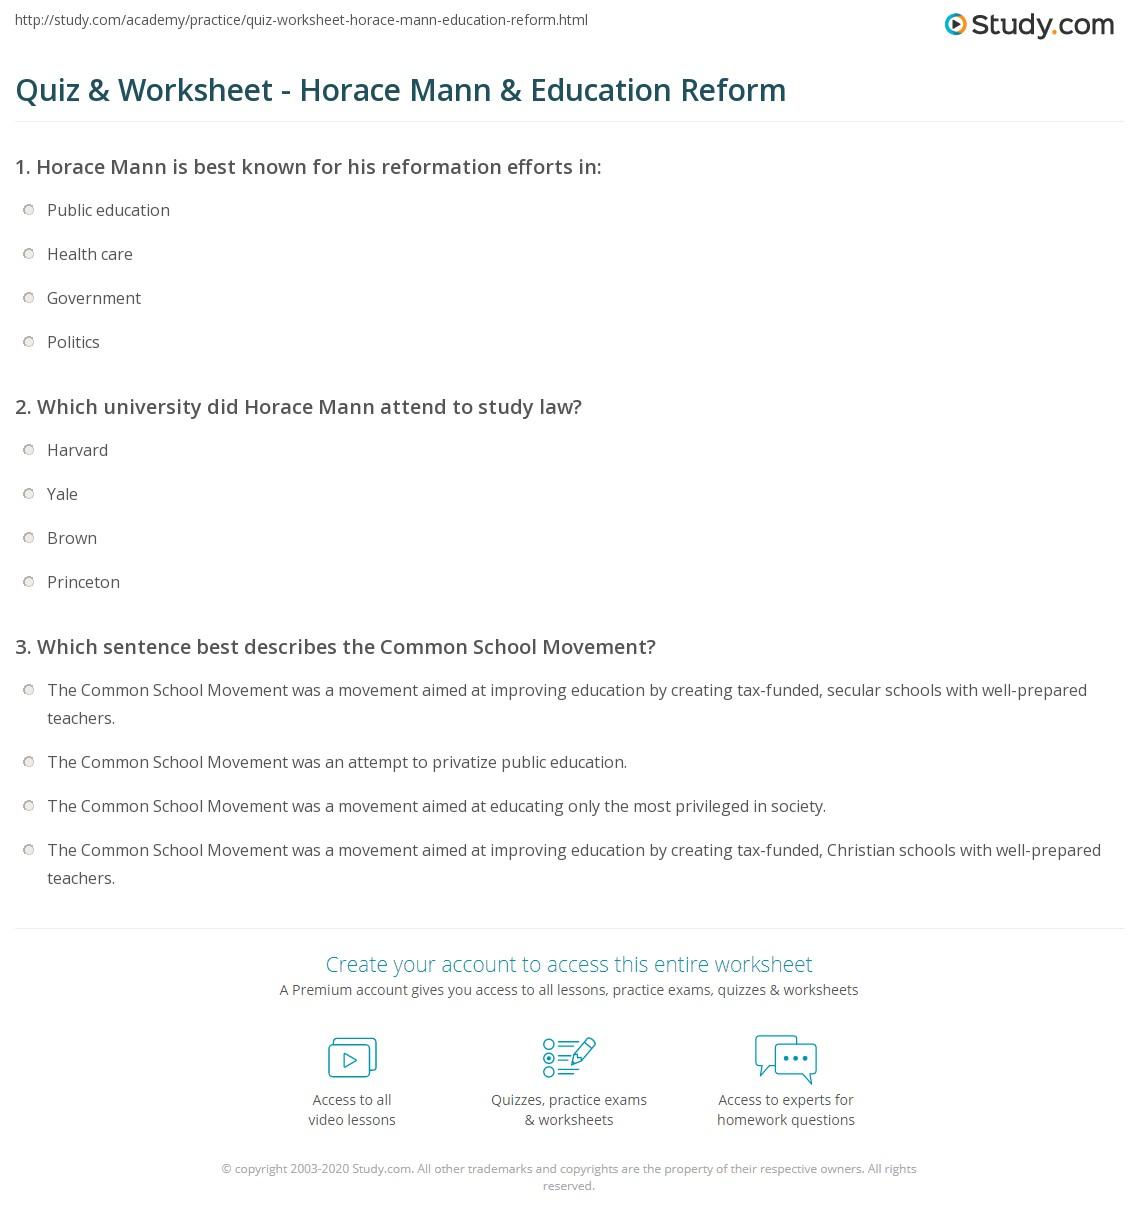 Quiz & Worksheet - Horace Mann & Education Reform | Study.com